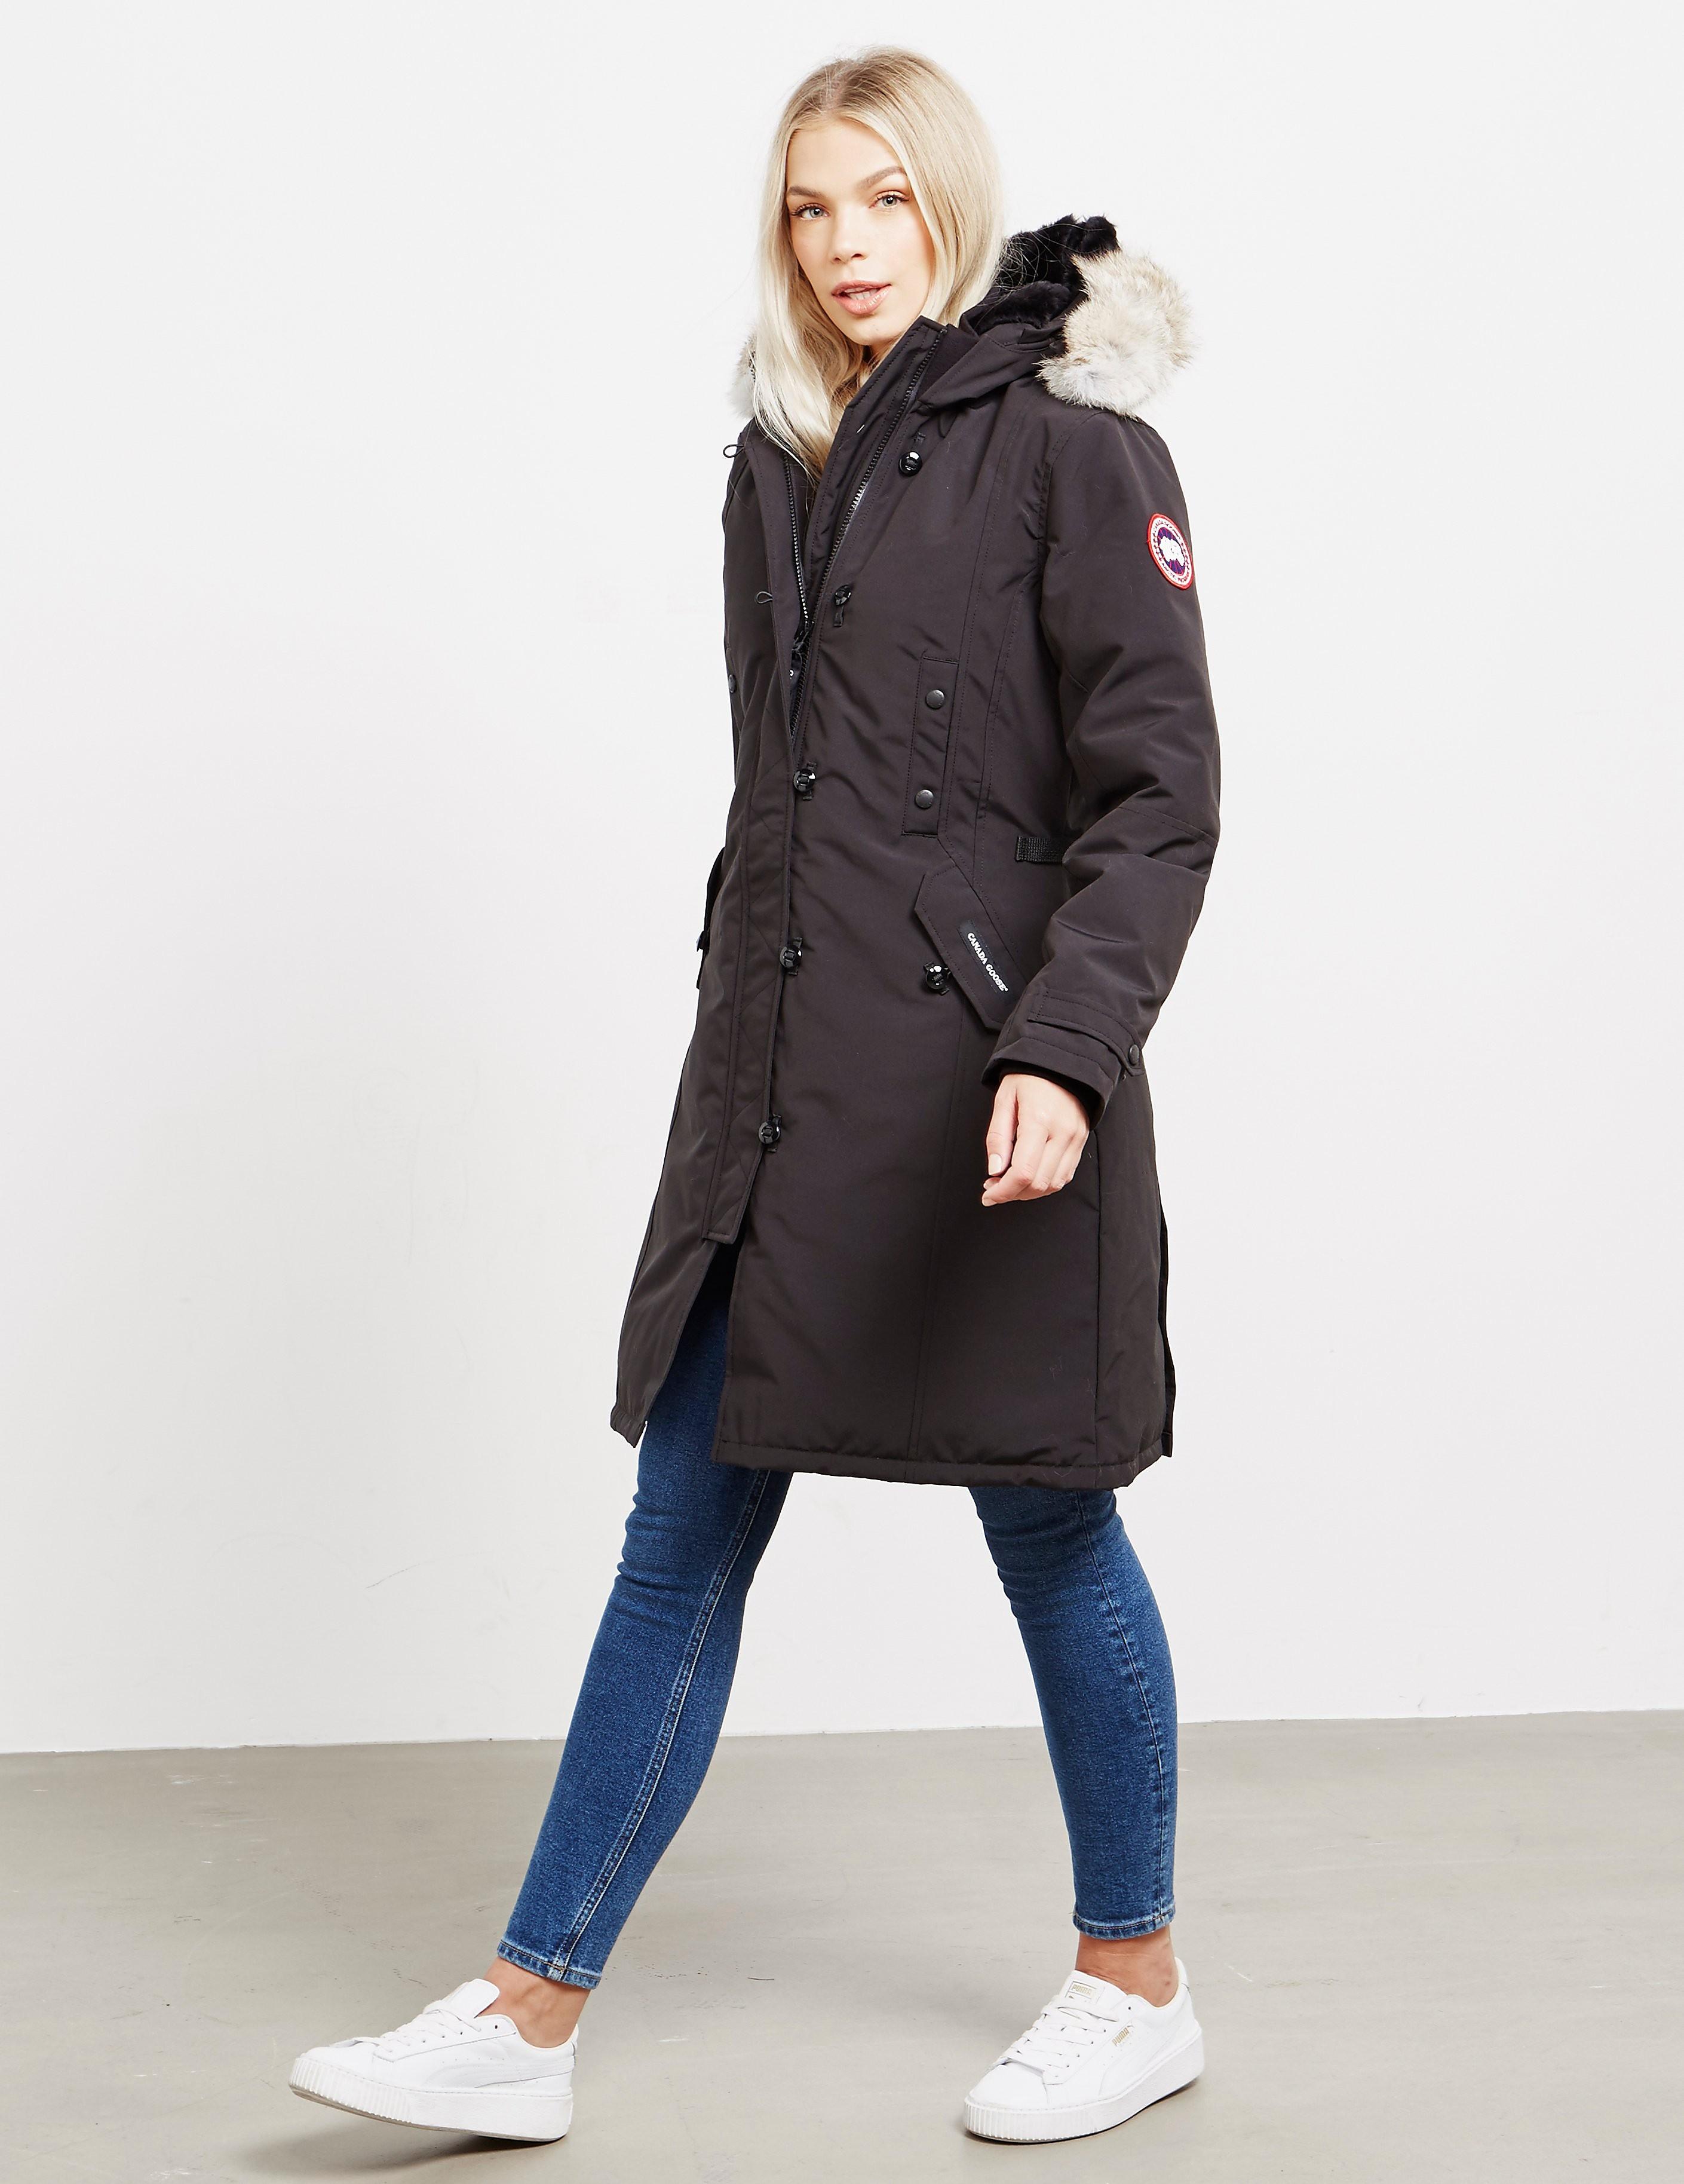 Canada Goose Kensington Padded Parka Jacket